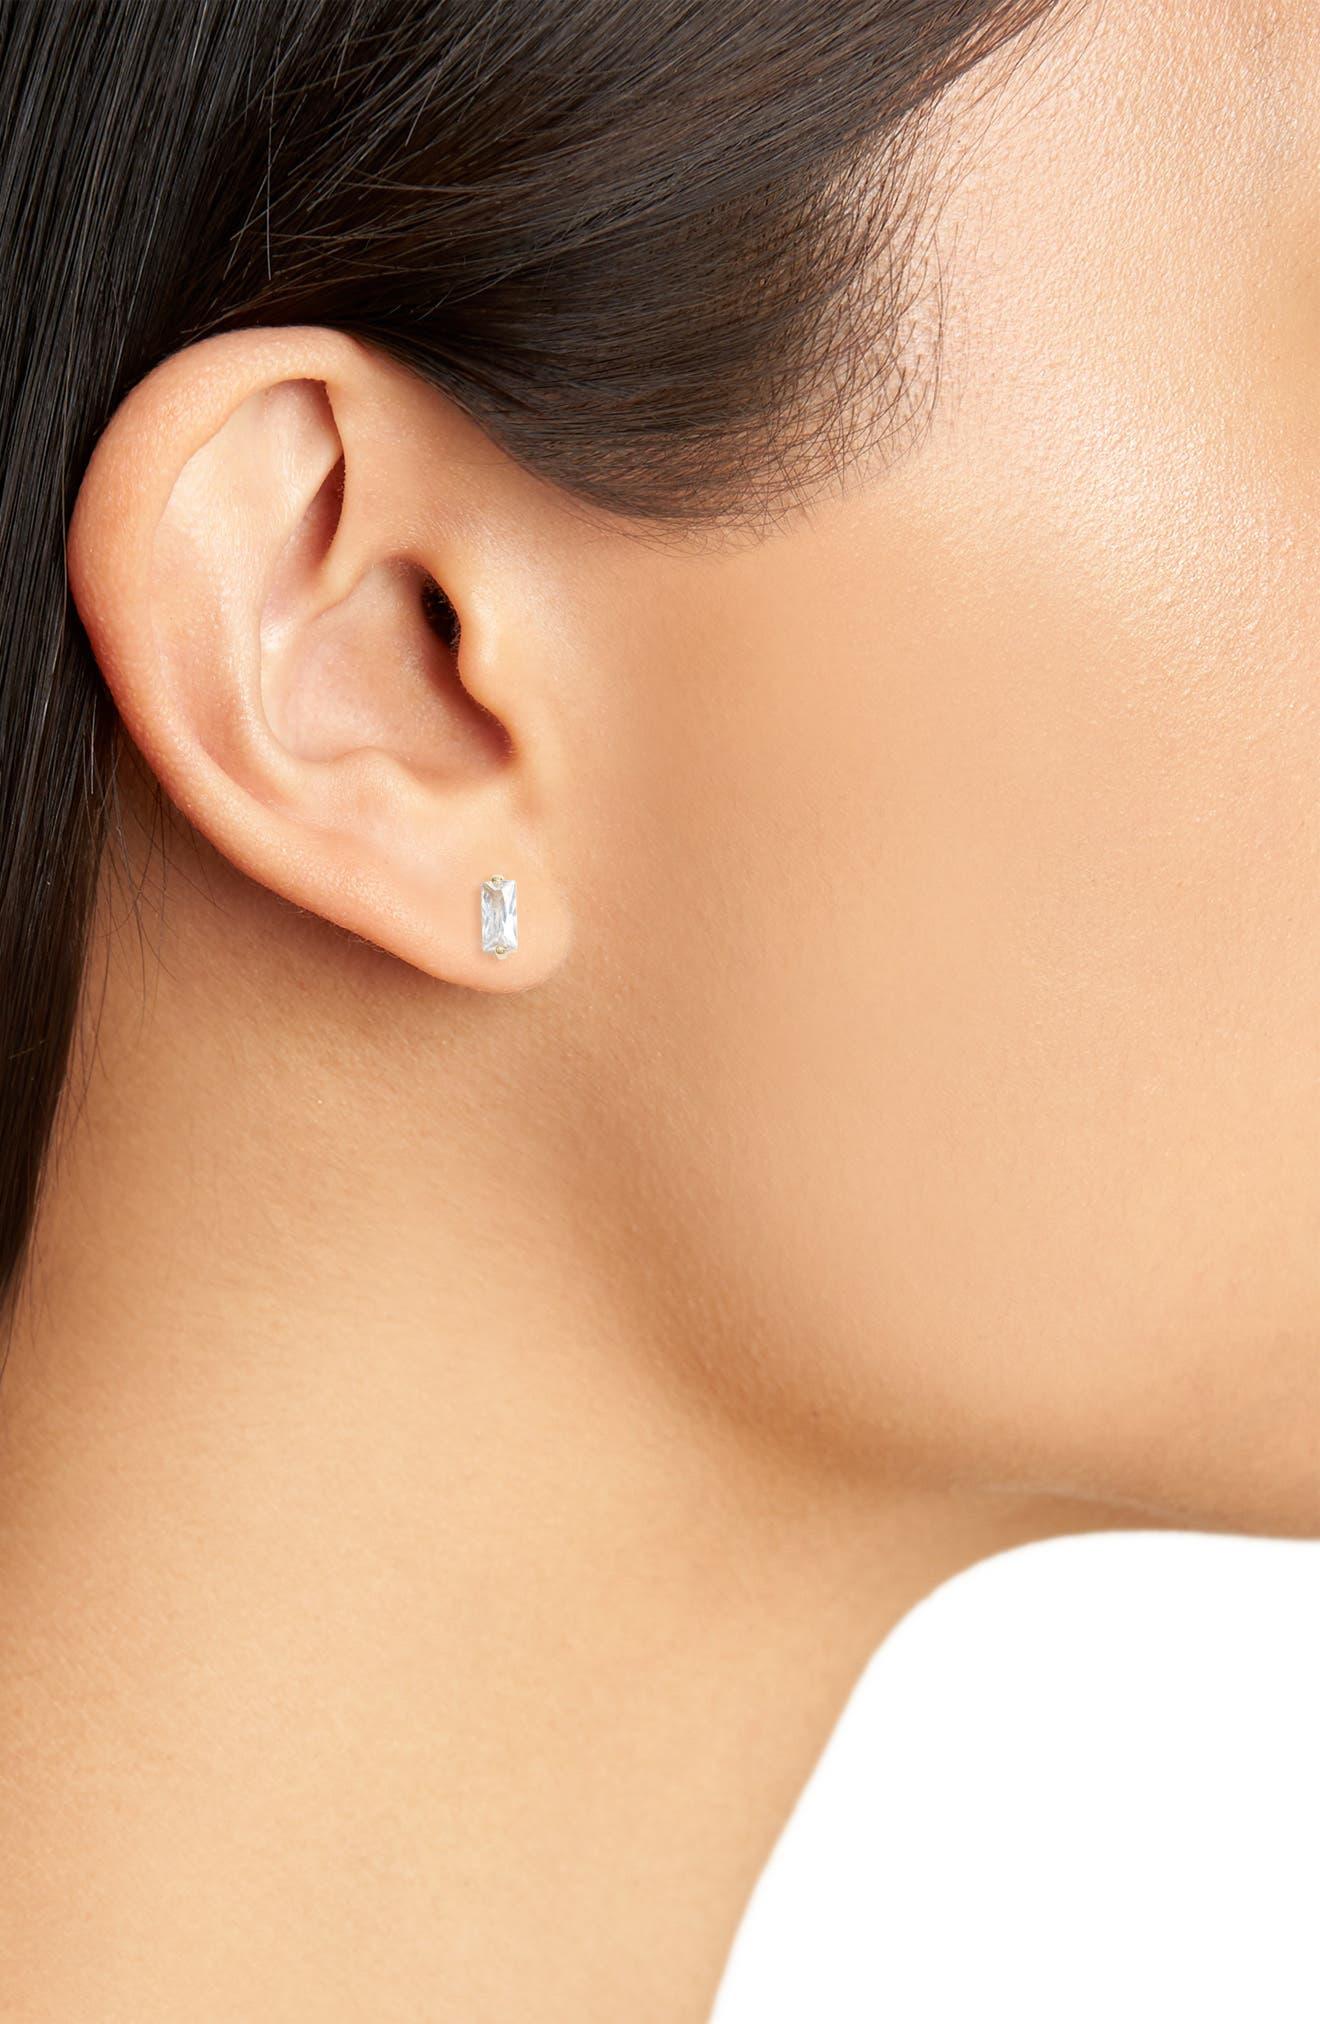 GORJANA, Amara Stud Earrings, Alternate thumbnail 2, color, GOLD